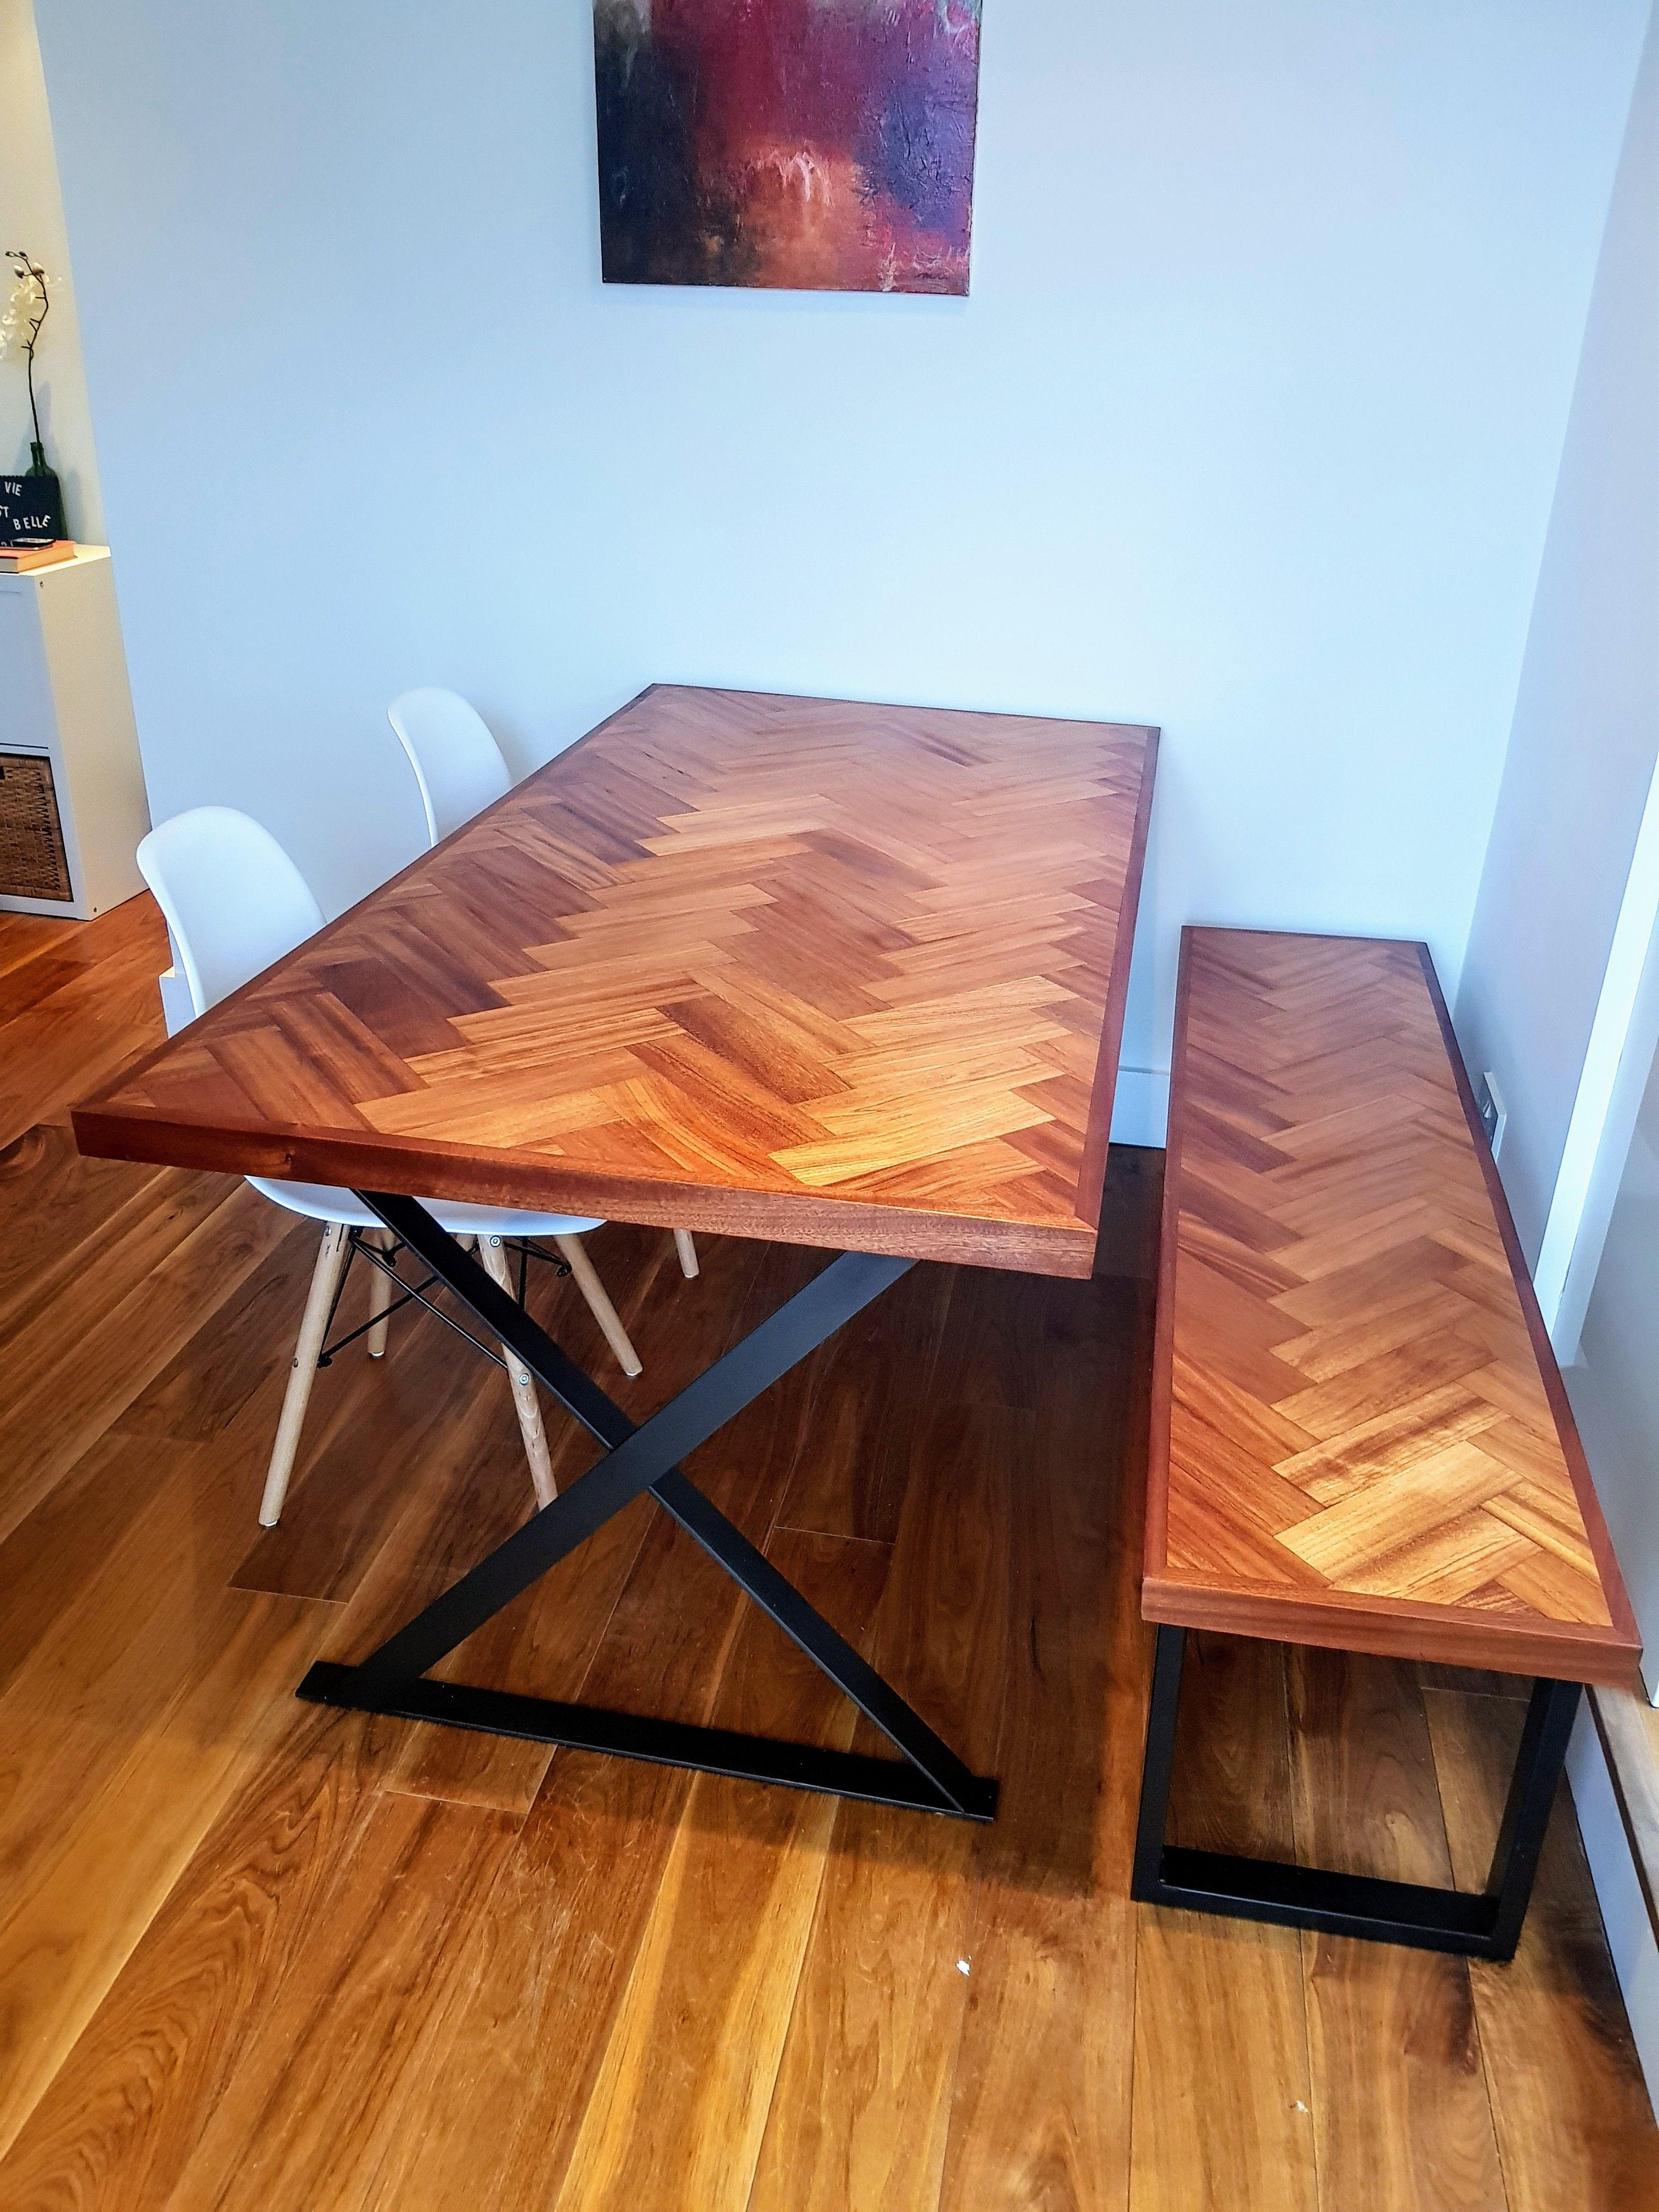 Built a Parquet Dining Table & Matching Bench handmade